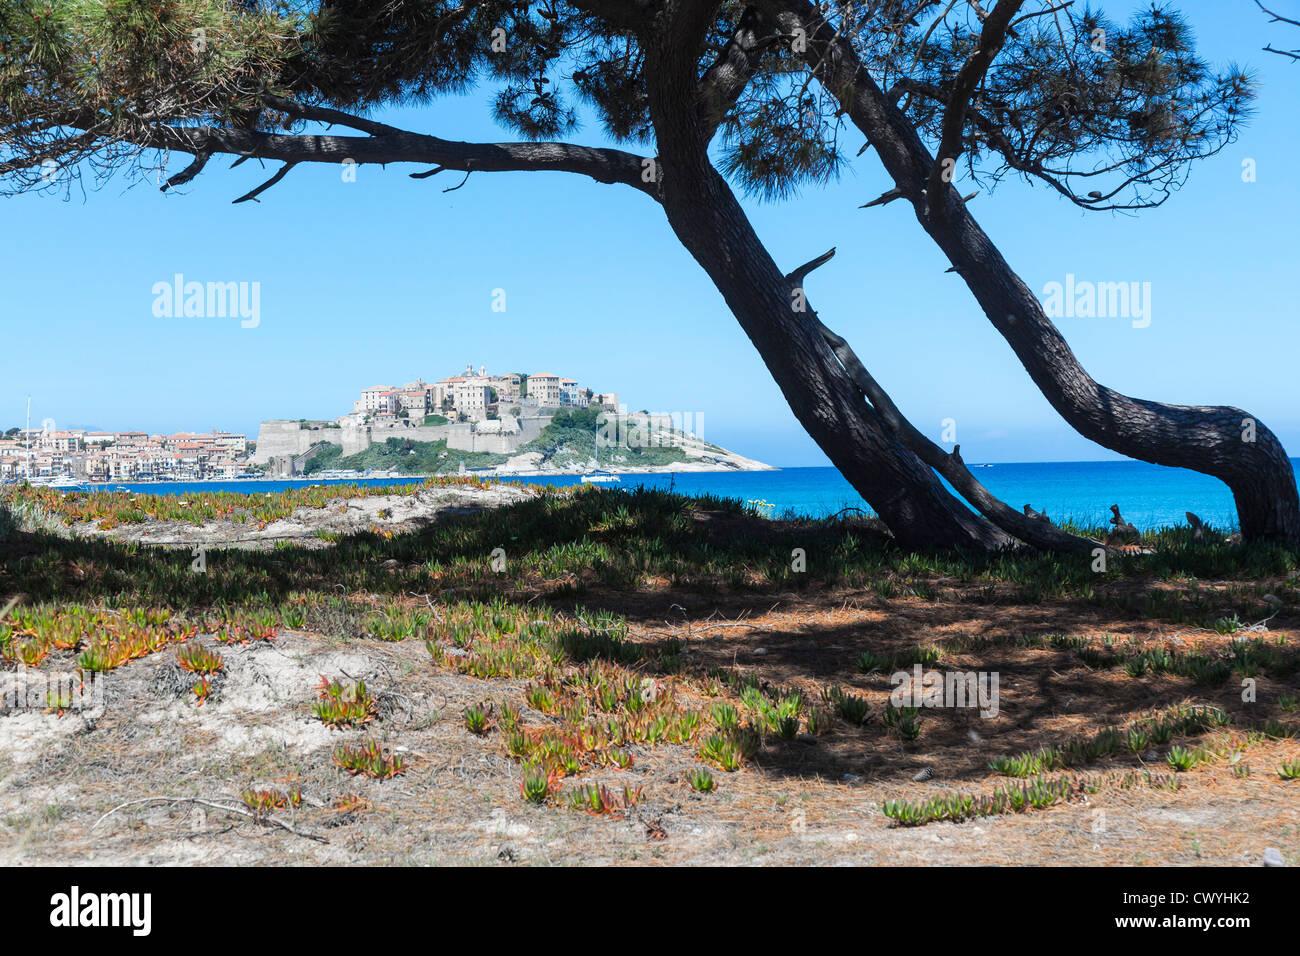 Pinien am Strand des Golf von Calvi, Korsika, Frankreich Stockbild